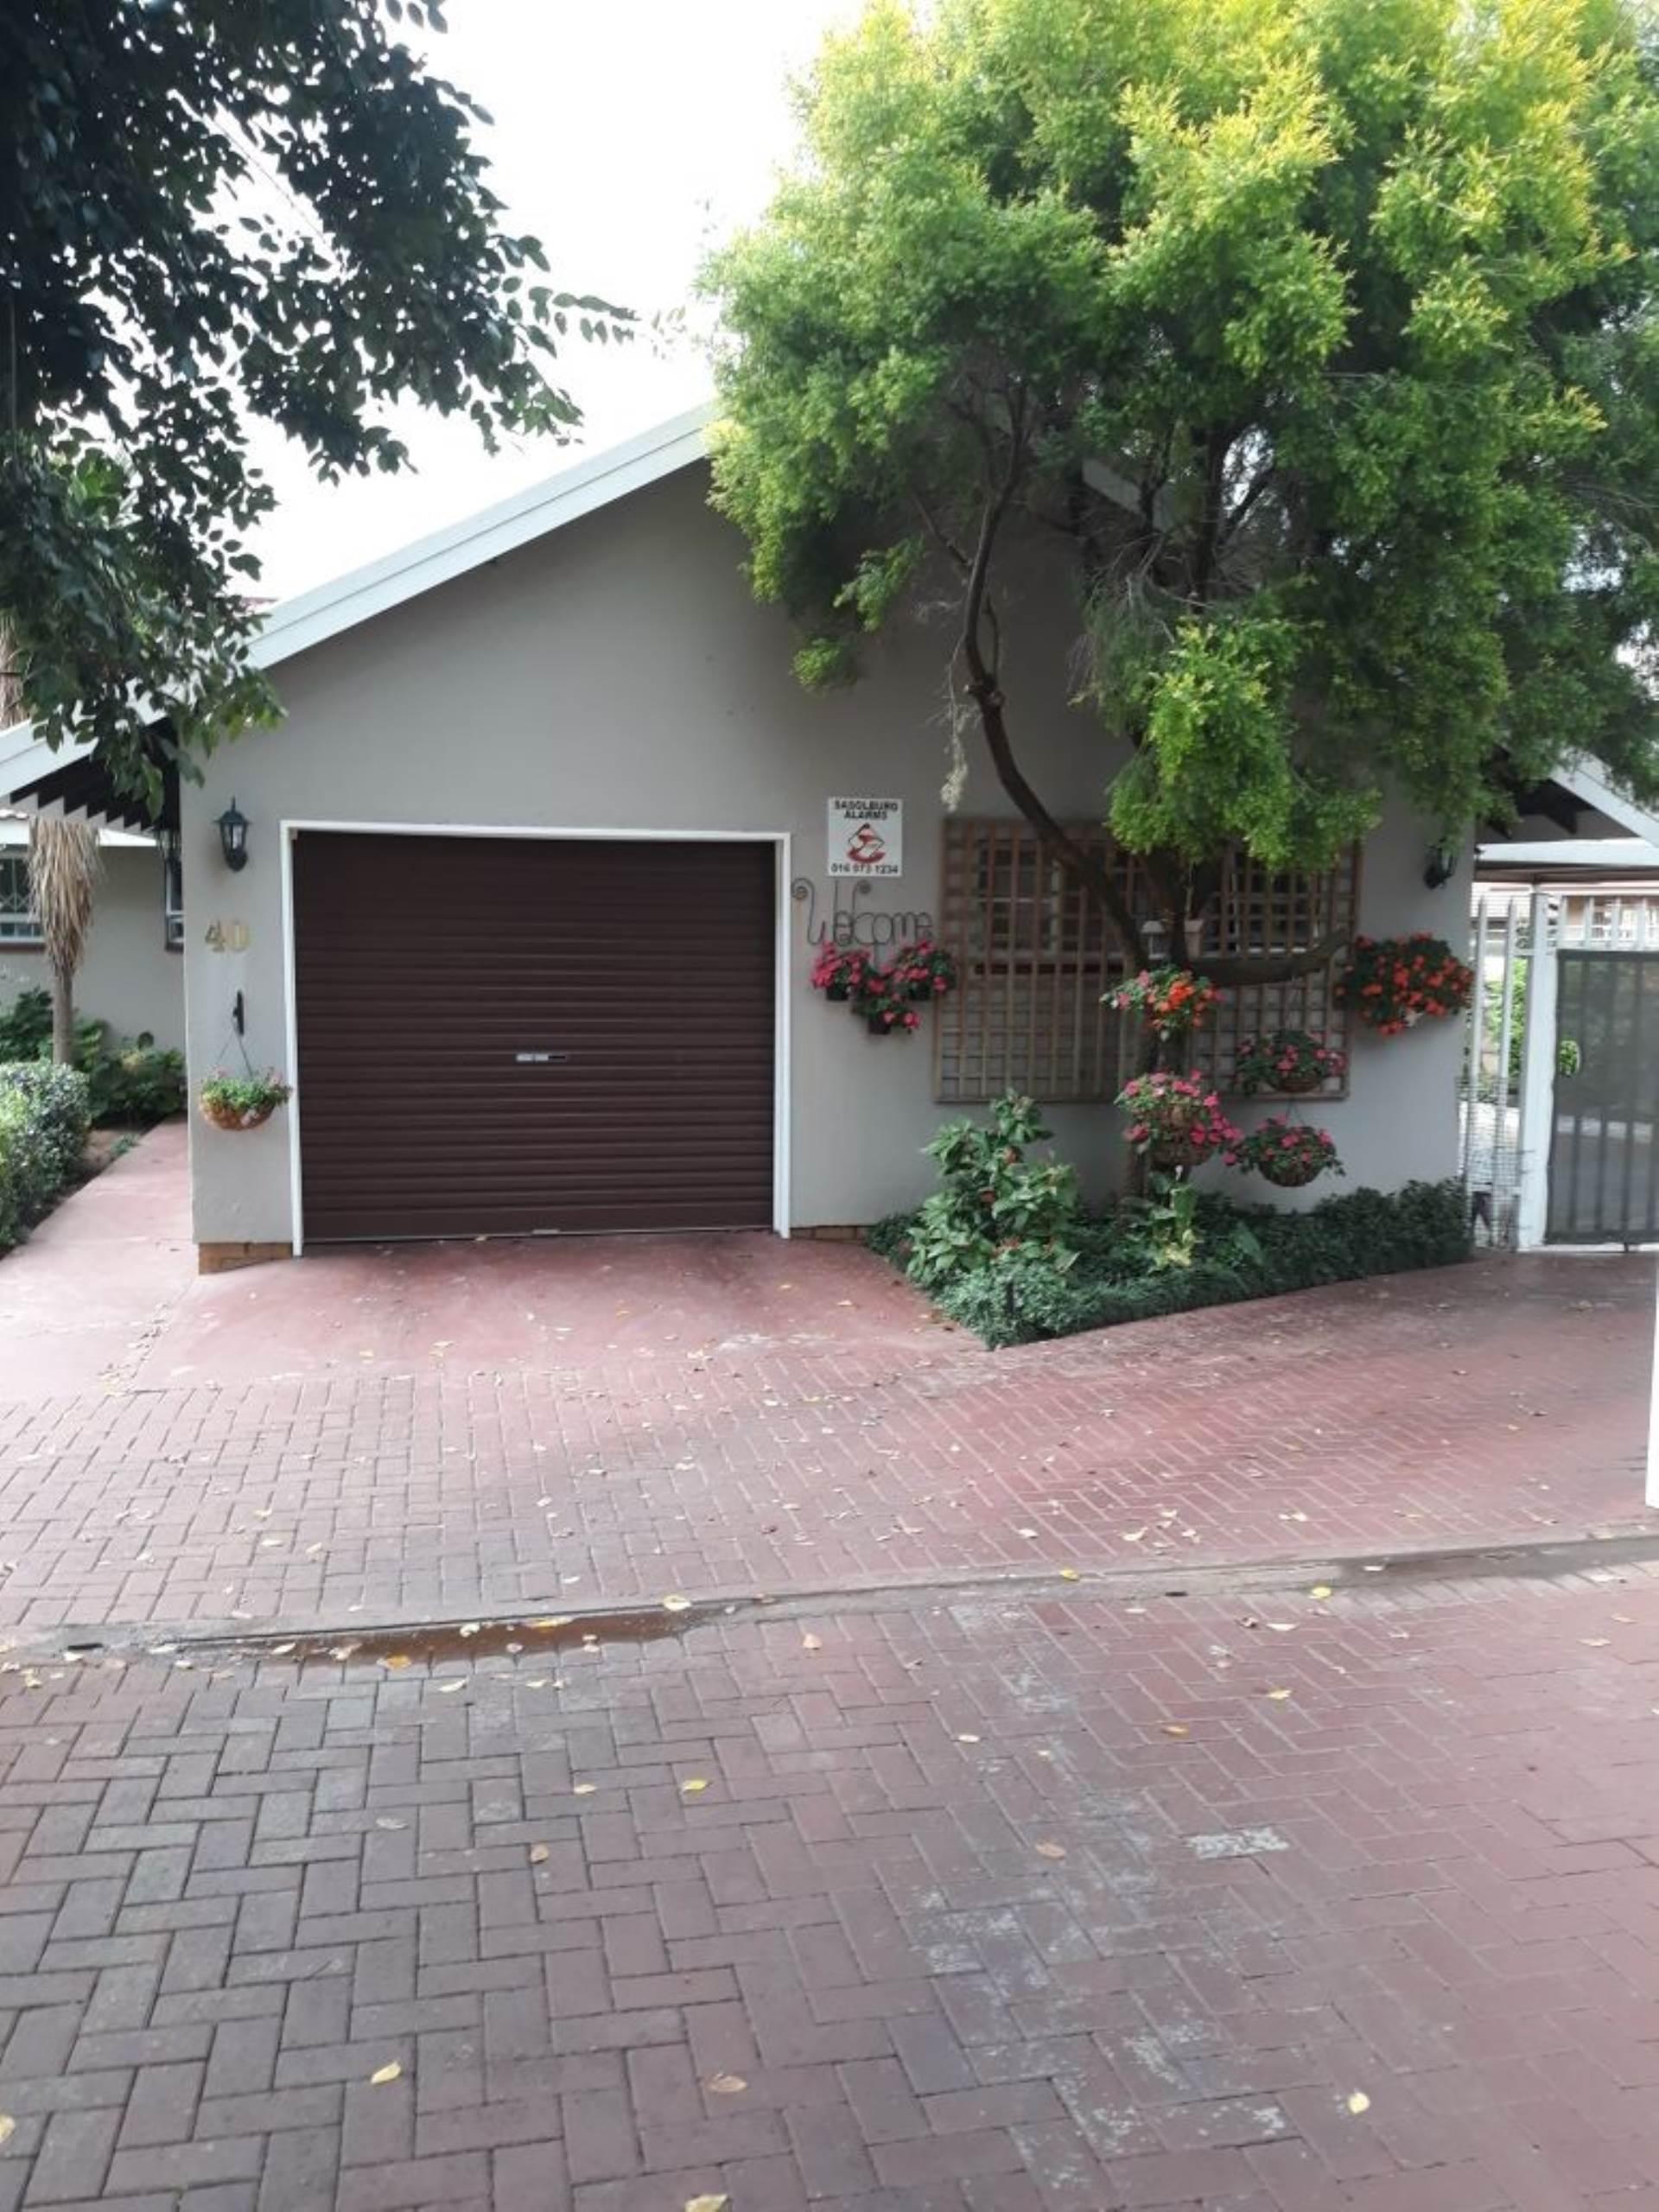 3 BedroomHouse For Sale In Vaalpark